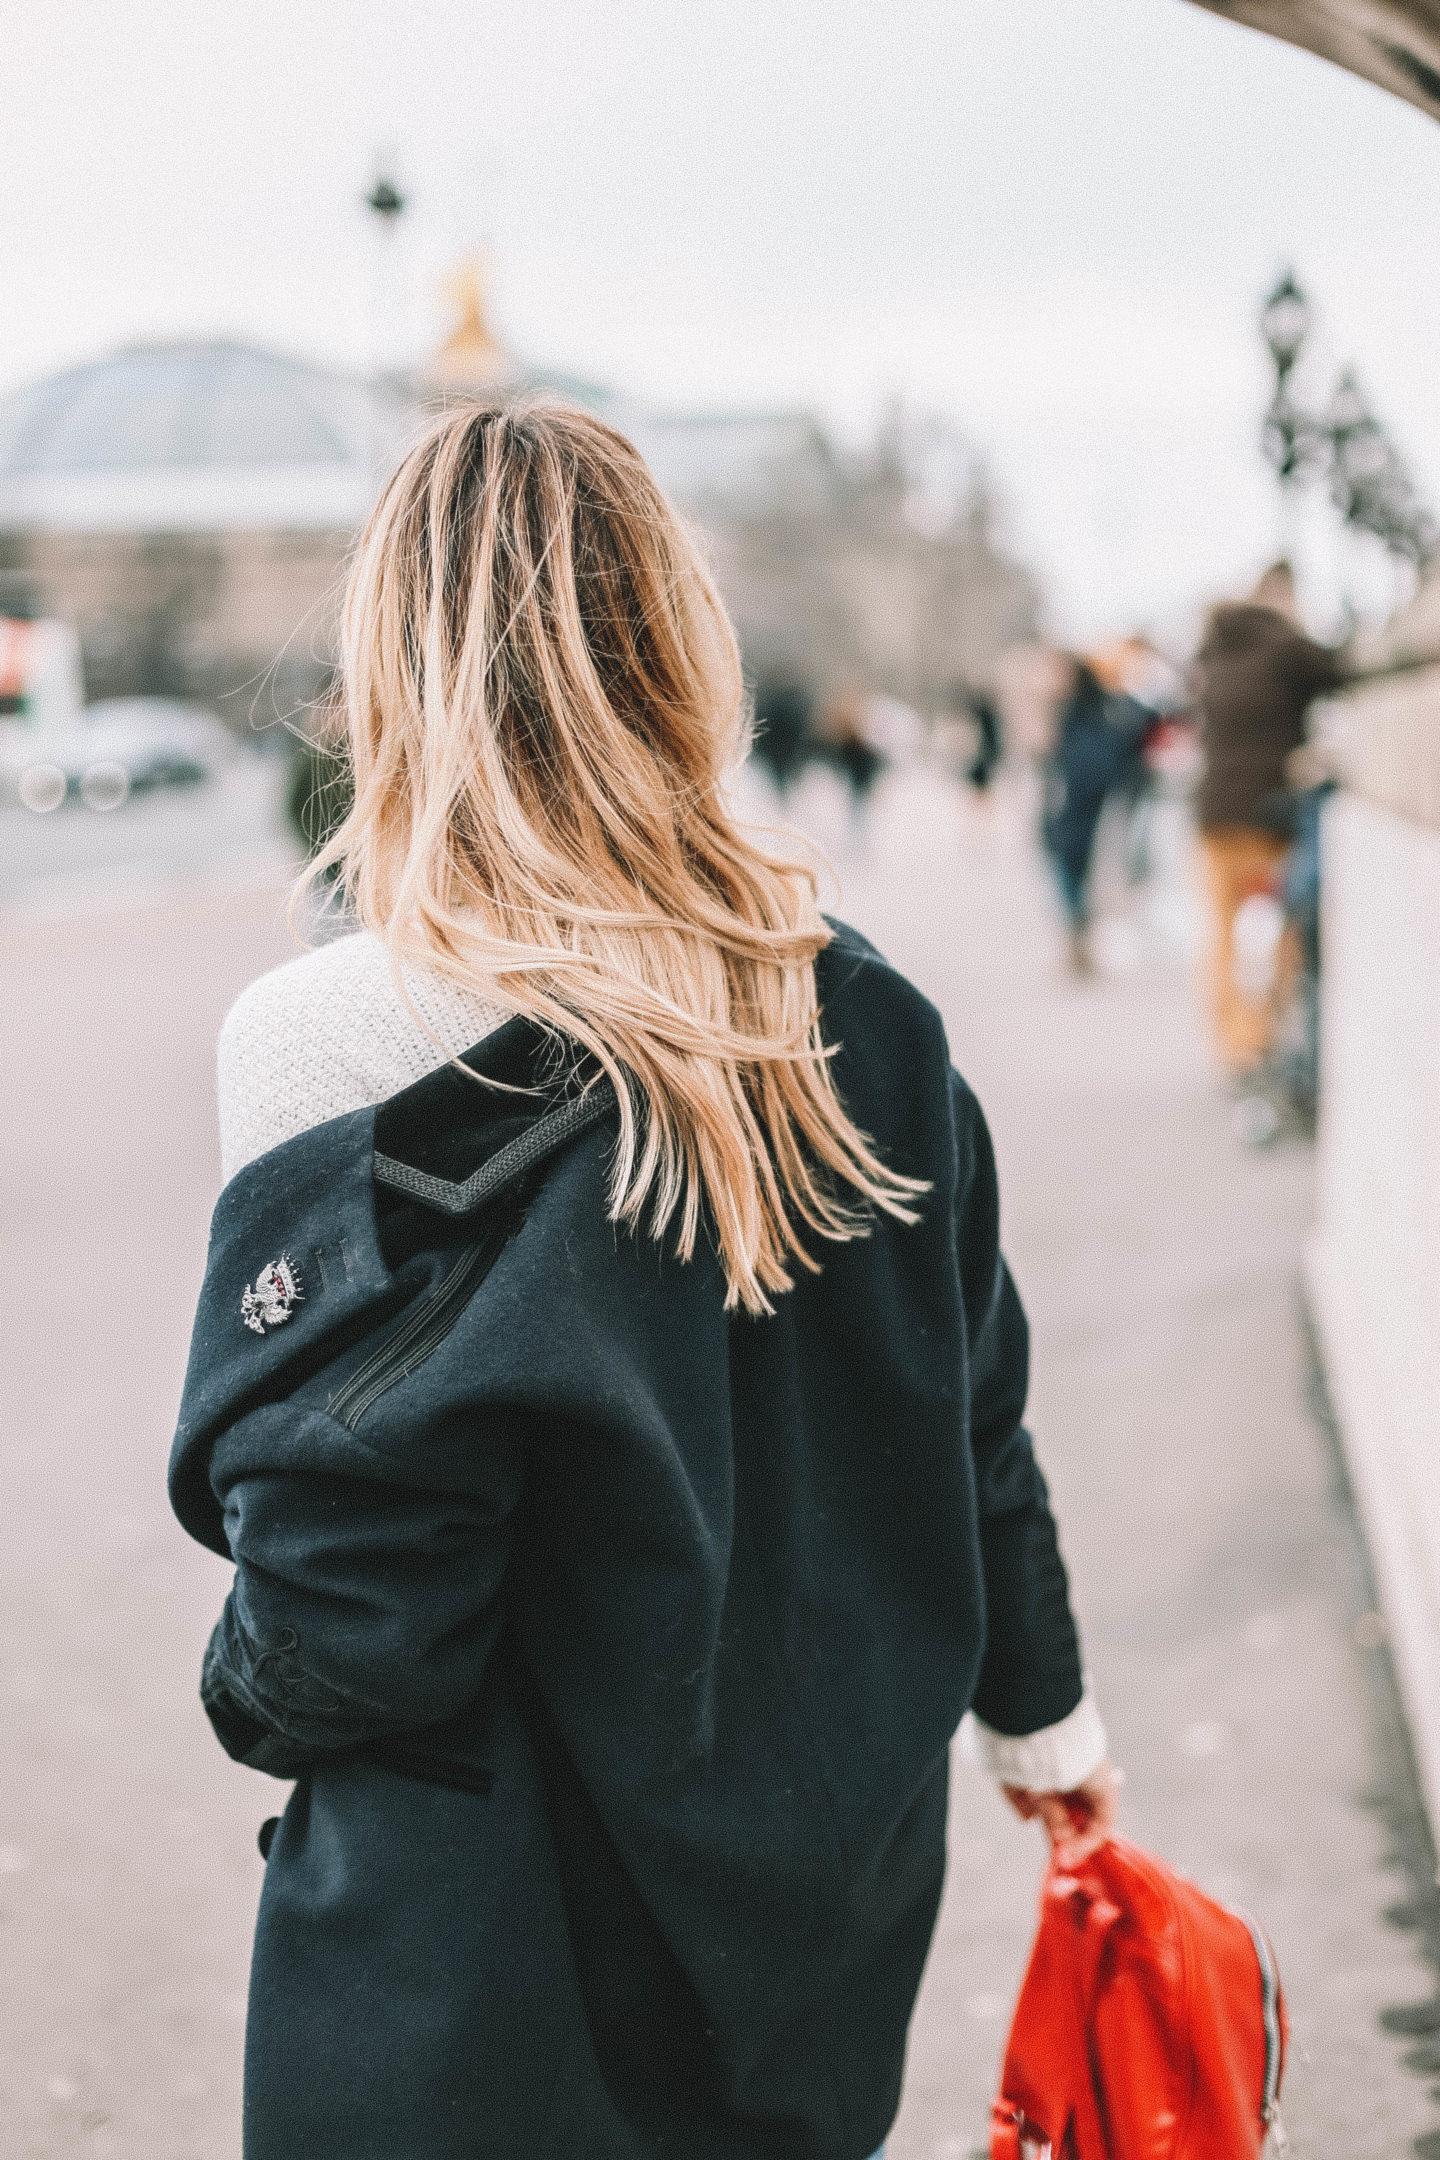 Balayage Californien - Blondie Baby blog mode et voyages